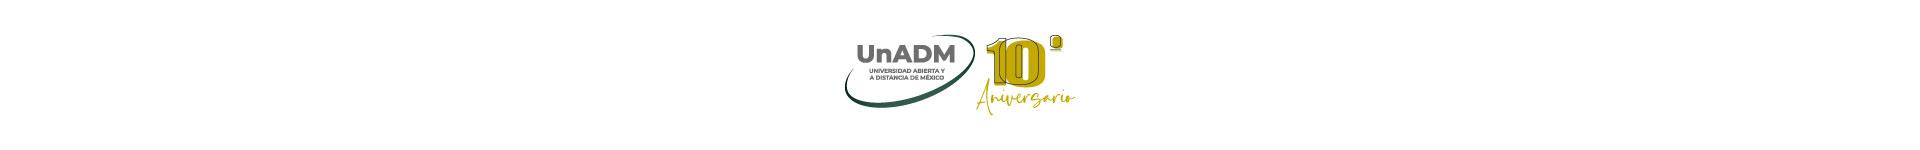 Portal UnADM